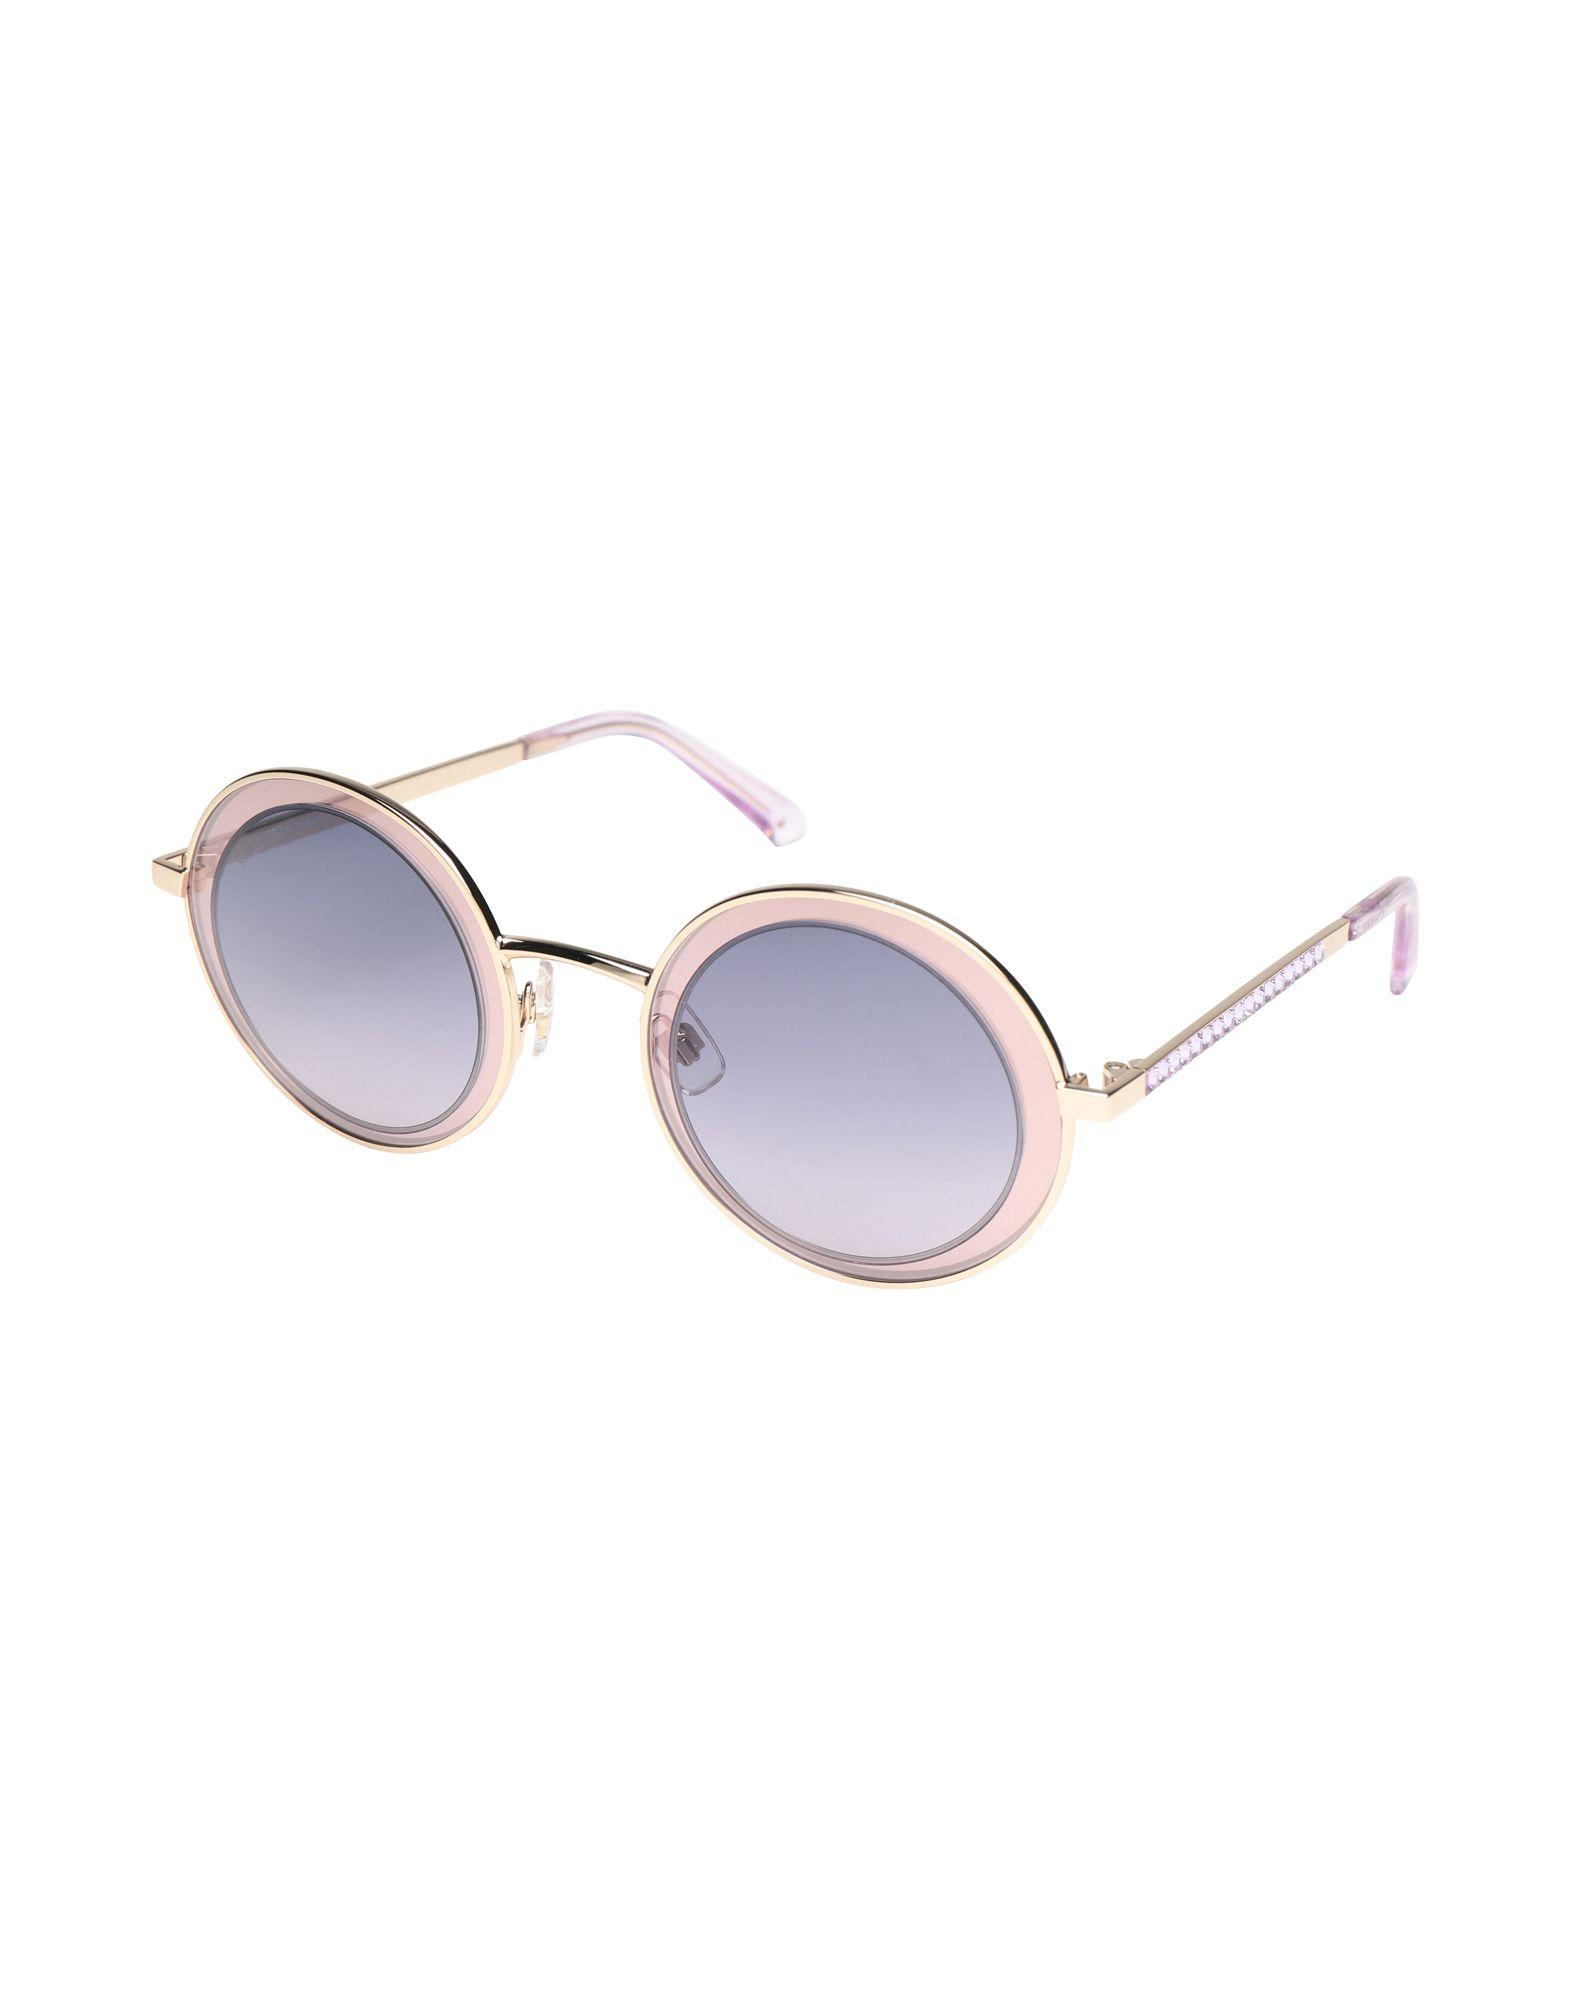 Фото - SWAROVSKI Солнечные очки кольца swarovski 5412018 17